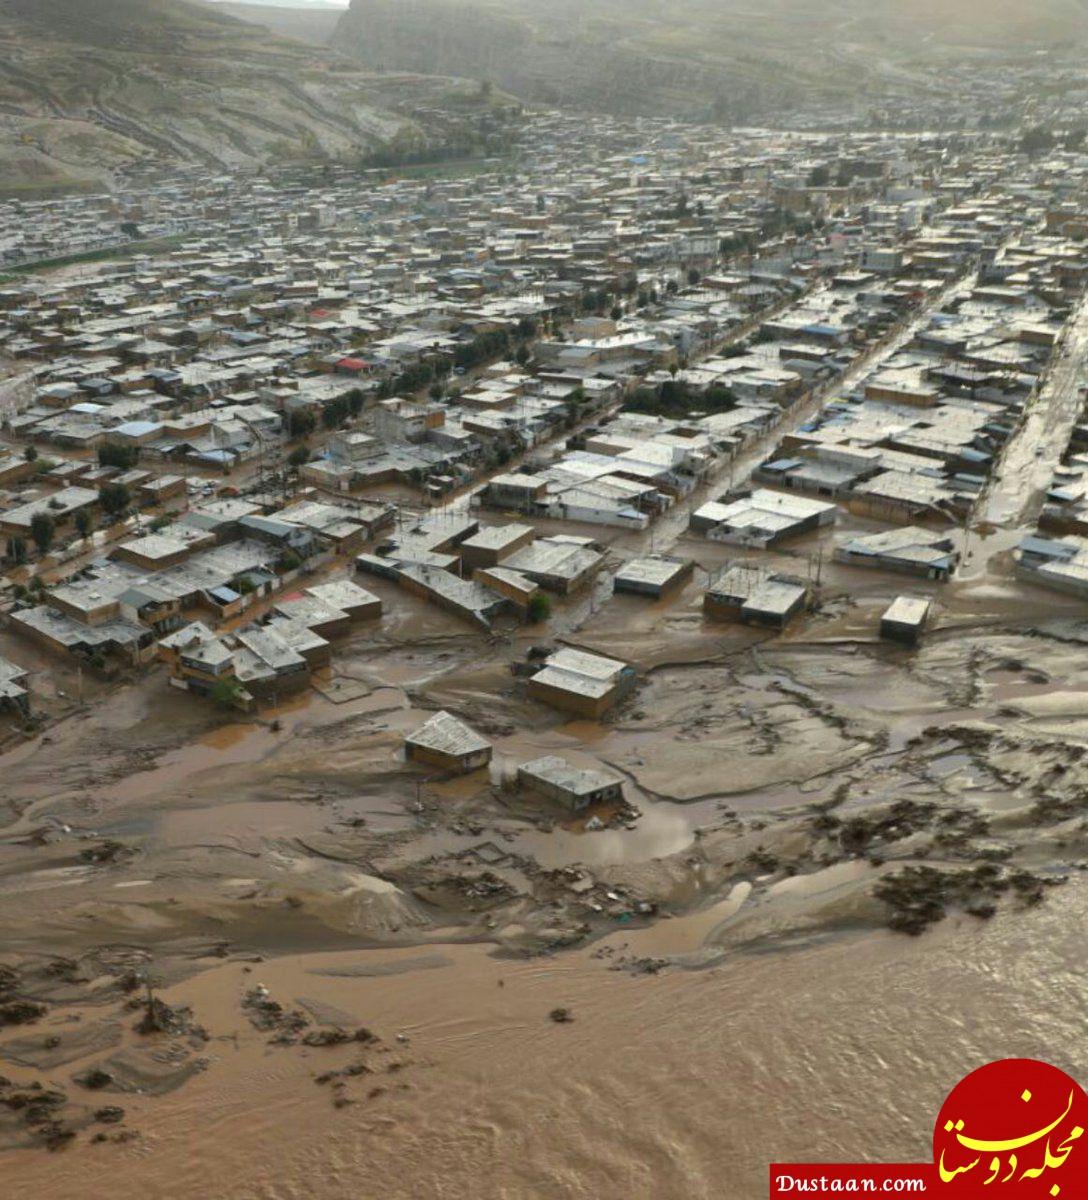 www.dustaan.com پلدختر ۲۴ ساعت پس از سیل، فرورفته در گل و لای +عکس